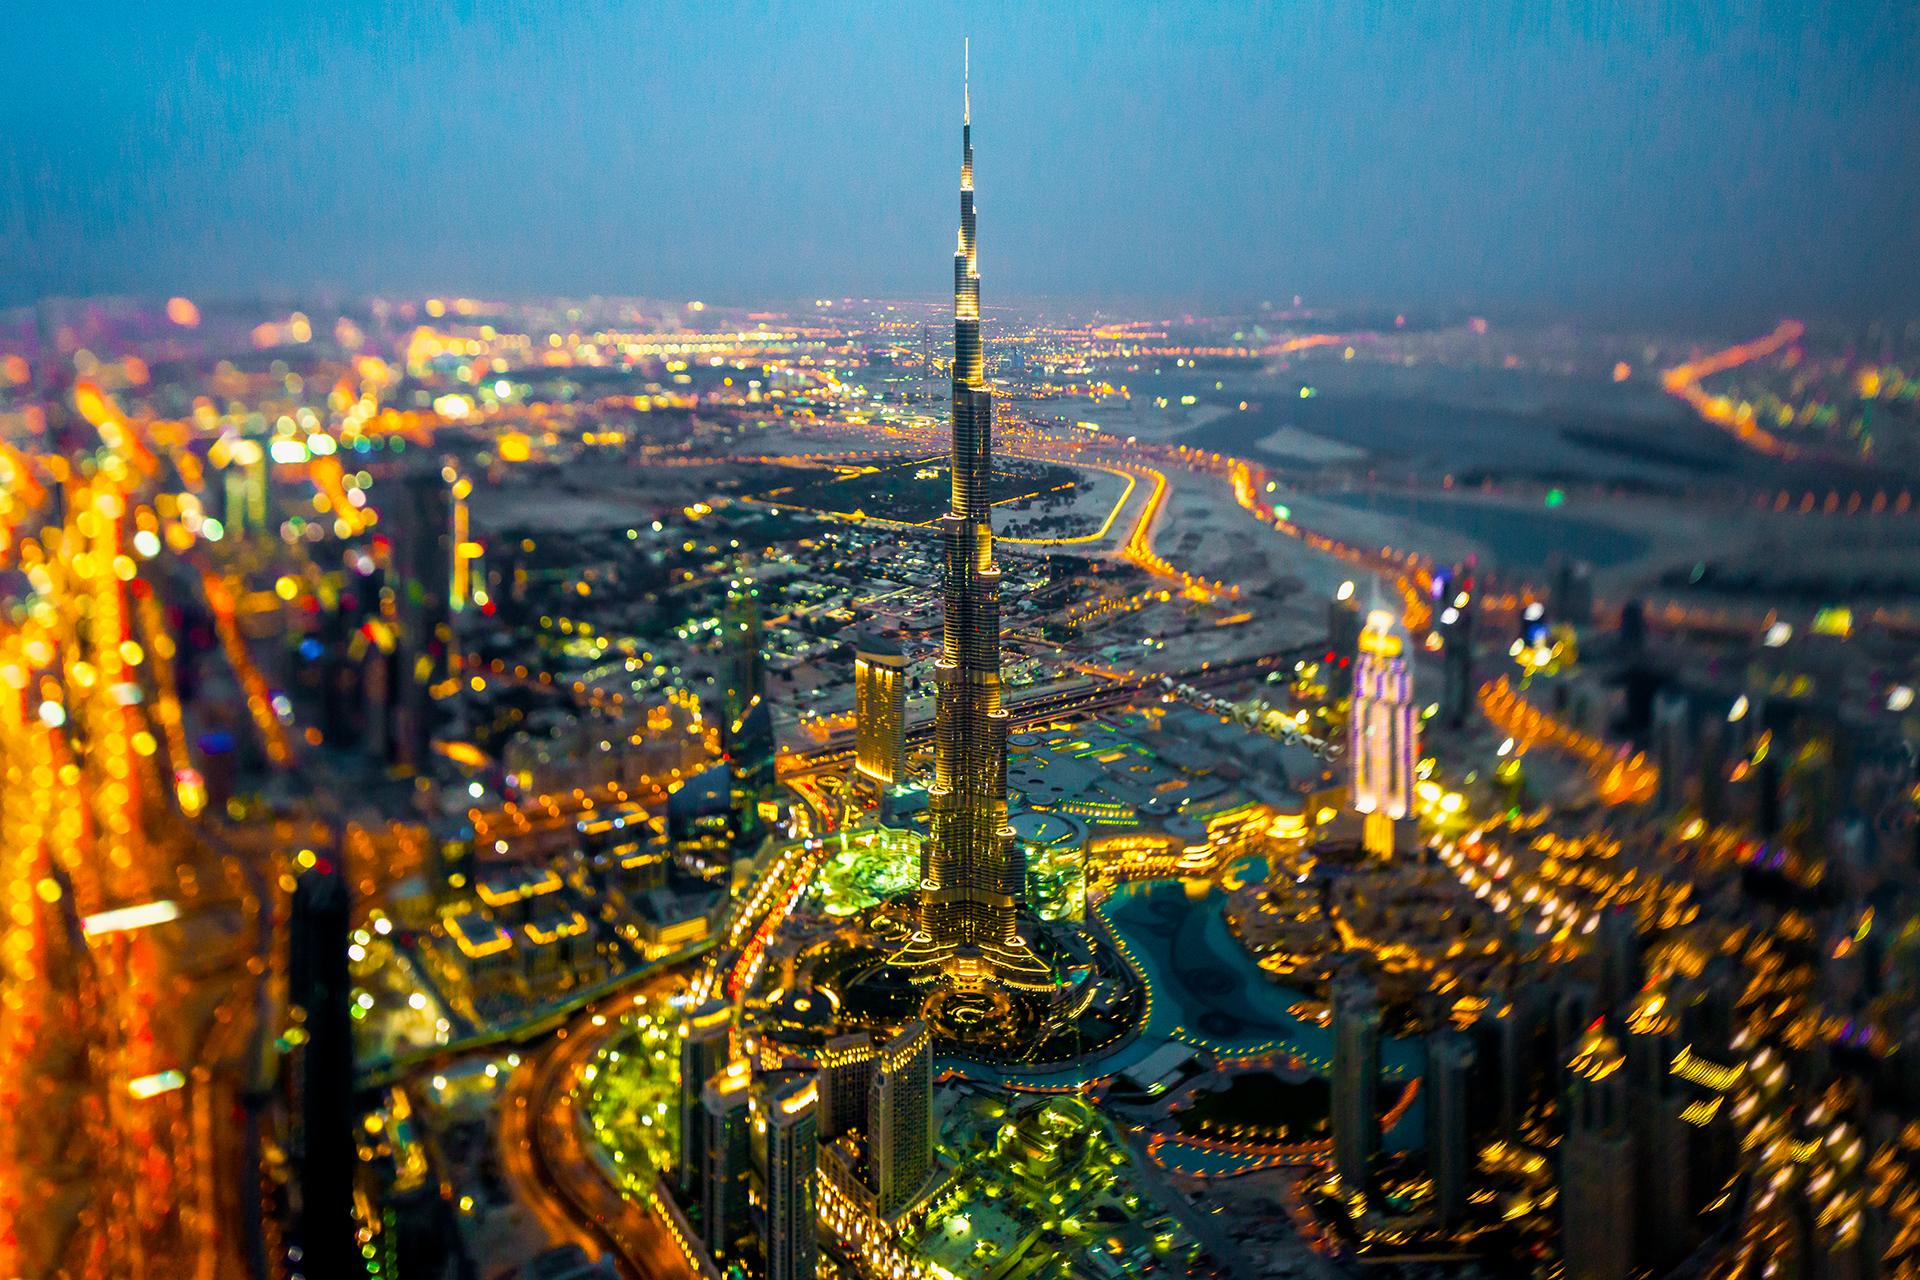 General 1920x1280 Dubai cityscape city lights tilt shift motion blur night Burj Khalifa aerial view bird's eye view skyscraper lights United Arab Emirates city photography colorful bokeh